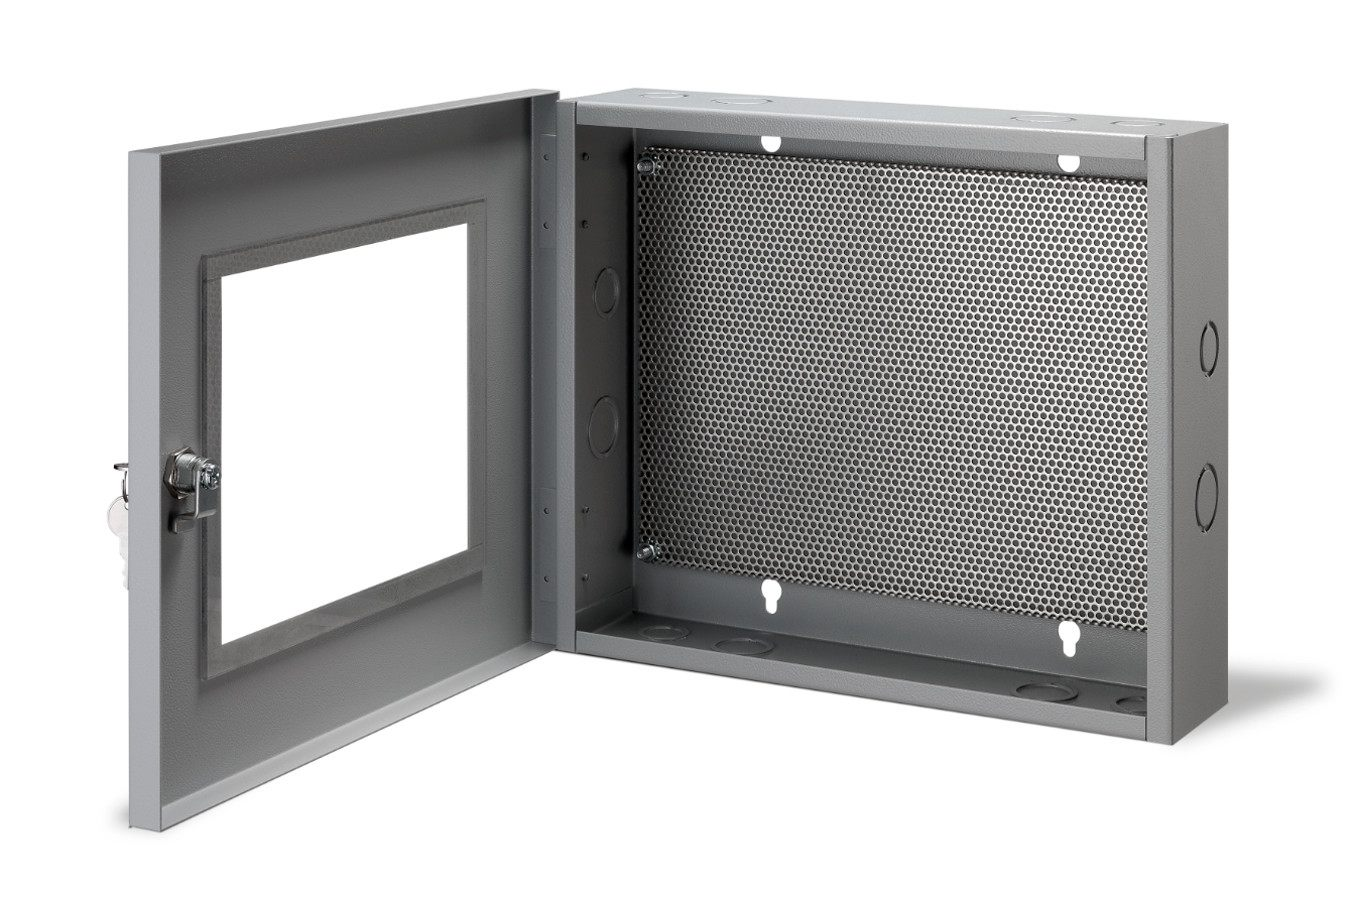 Siemens  567-556 Enclosures